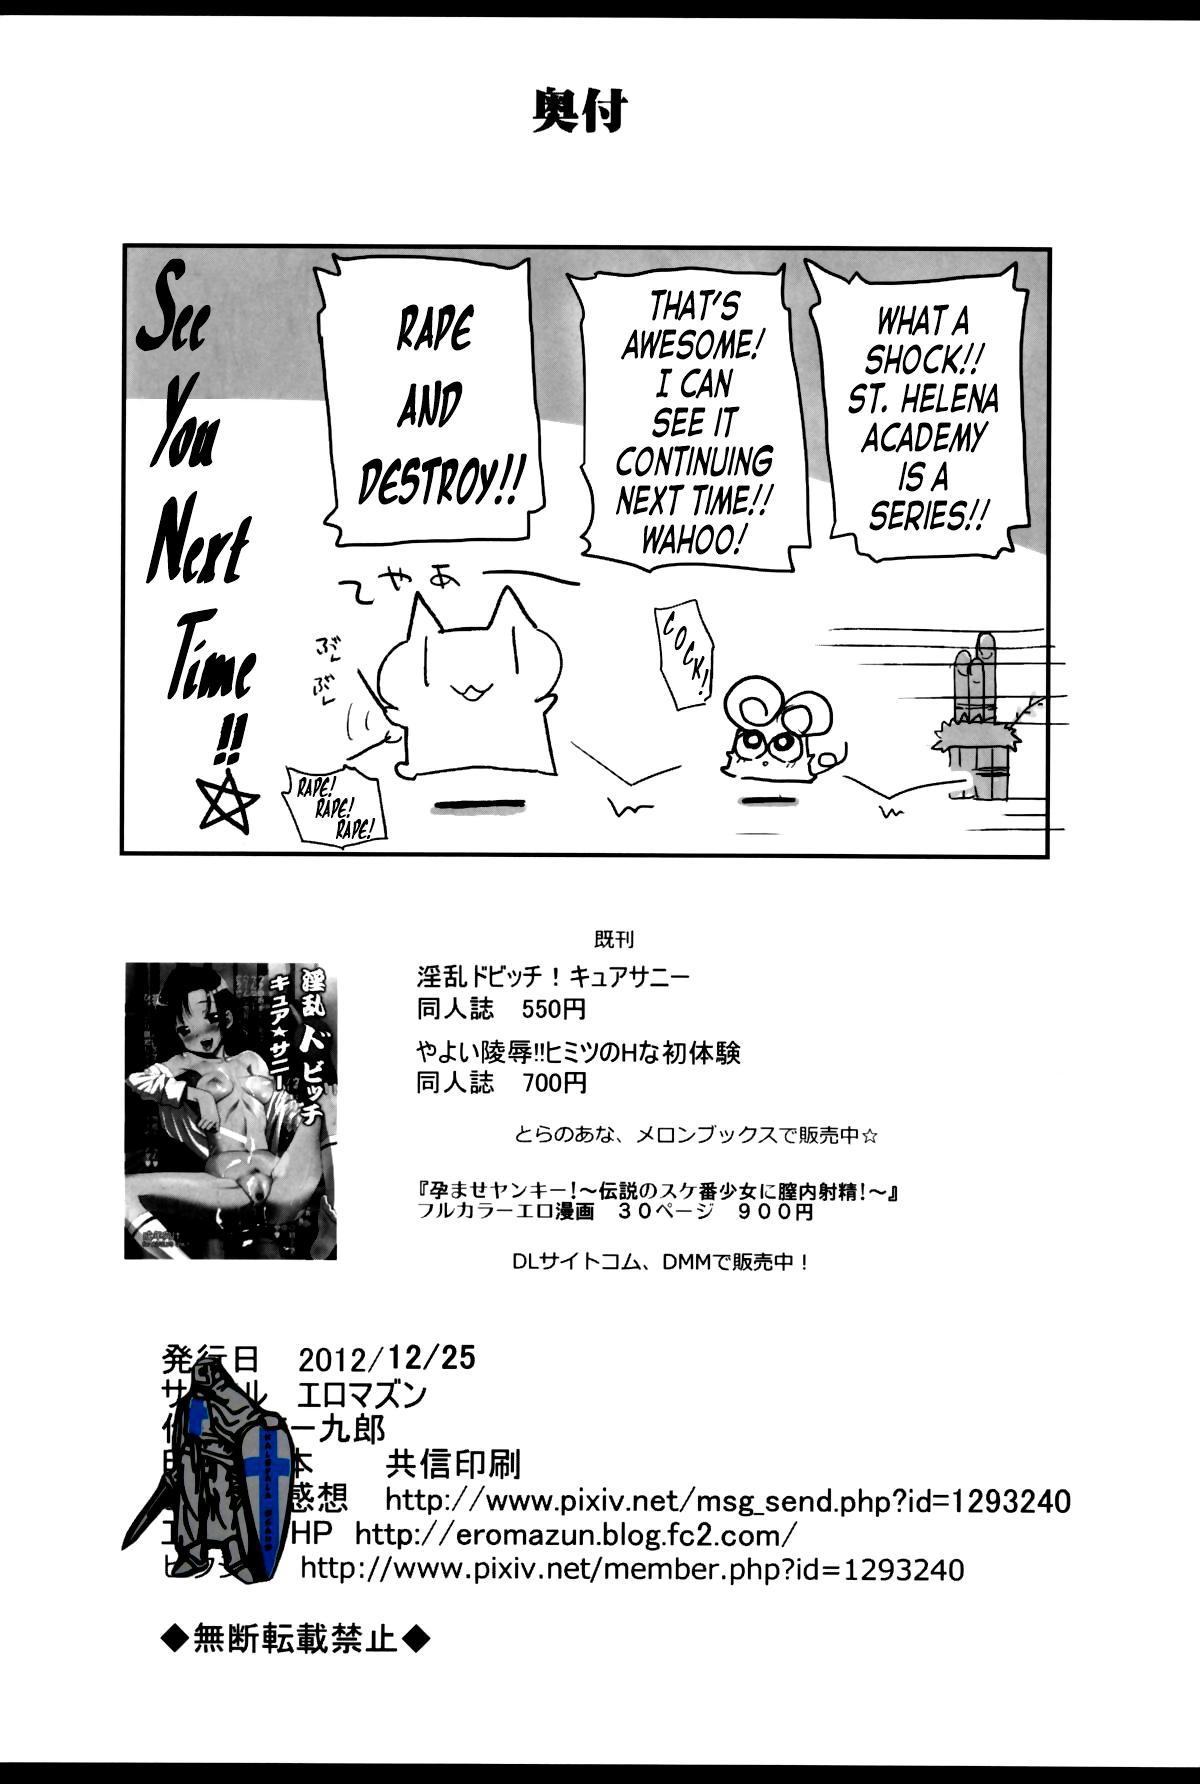 [Eromazun (Ma-Kurou)] Saint Helena Gakuen ~ Terrorist ni Senkyosareta Jogakuen de Rape Matsuri!~   Saint Helena Academy ~A School Occupied by Terrorists Becomes a Rape Festival!~ (Various) [English] [B.E.C. Scans] 41